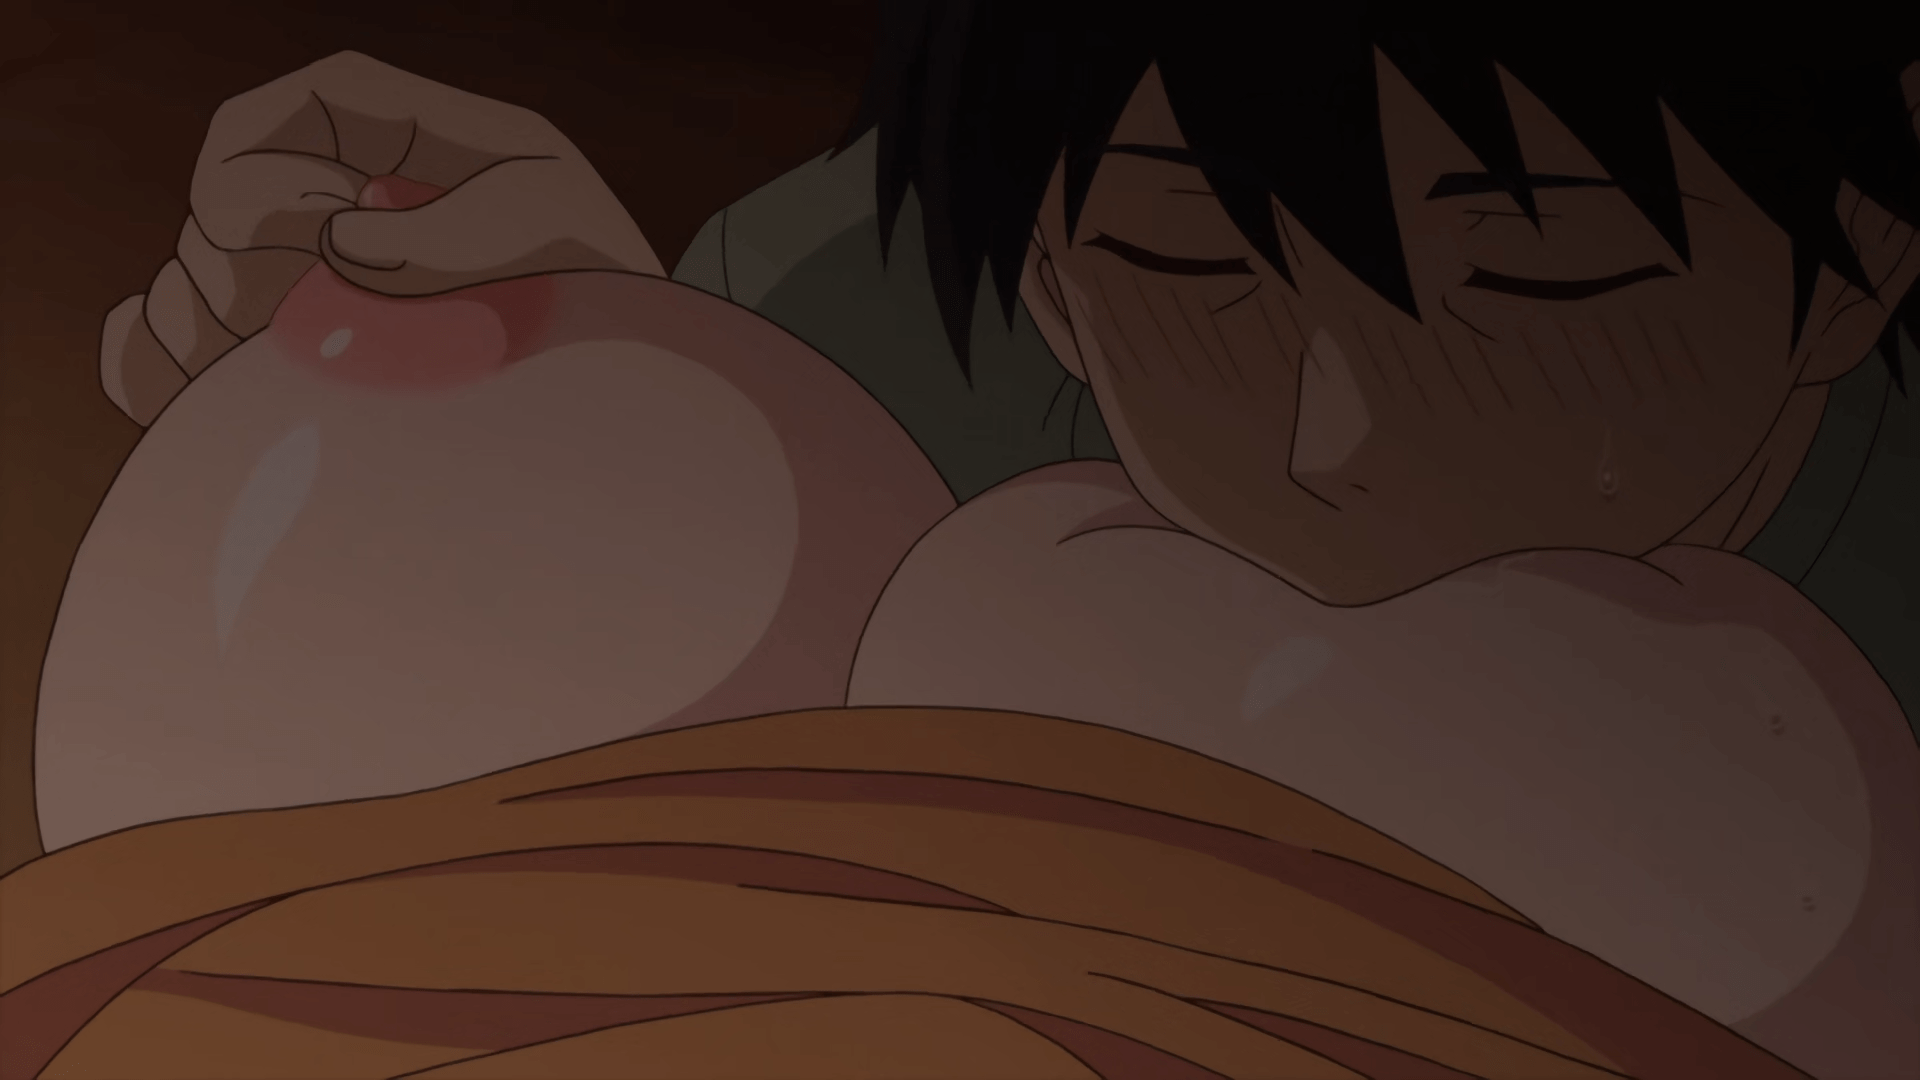 HentaiVideos.net Showtime! Uta no Onee-san Datte Shitai Episode 3